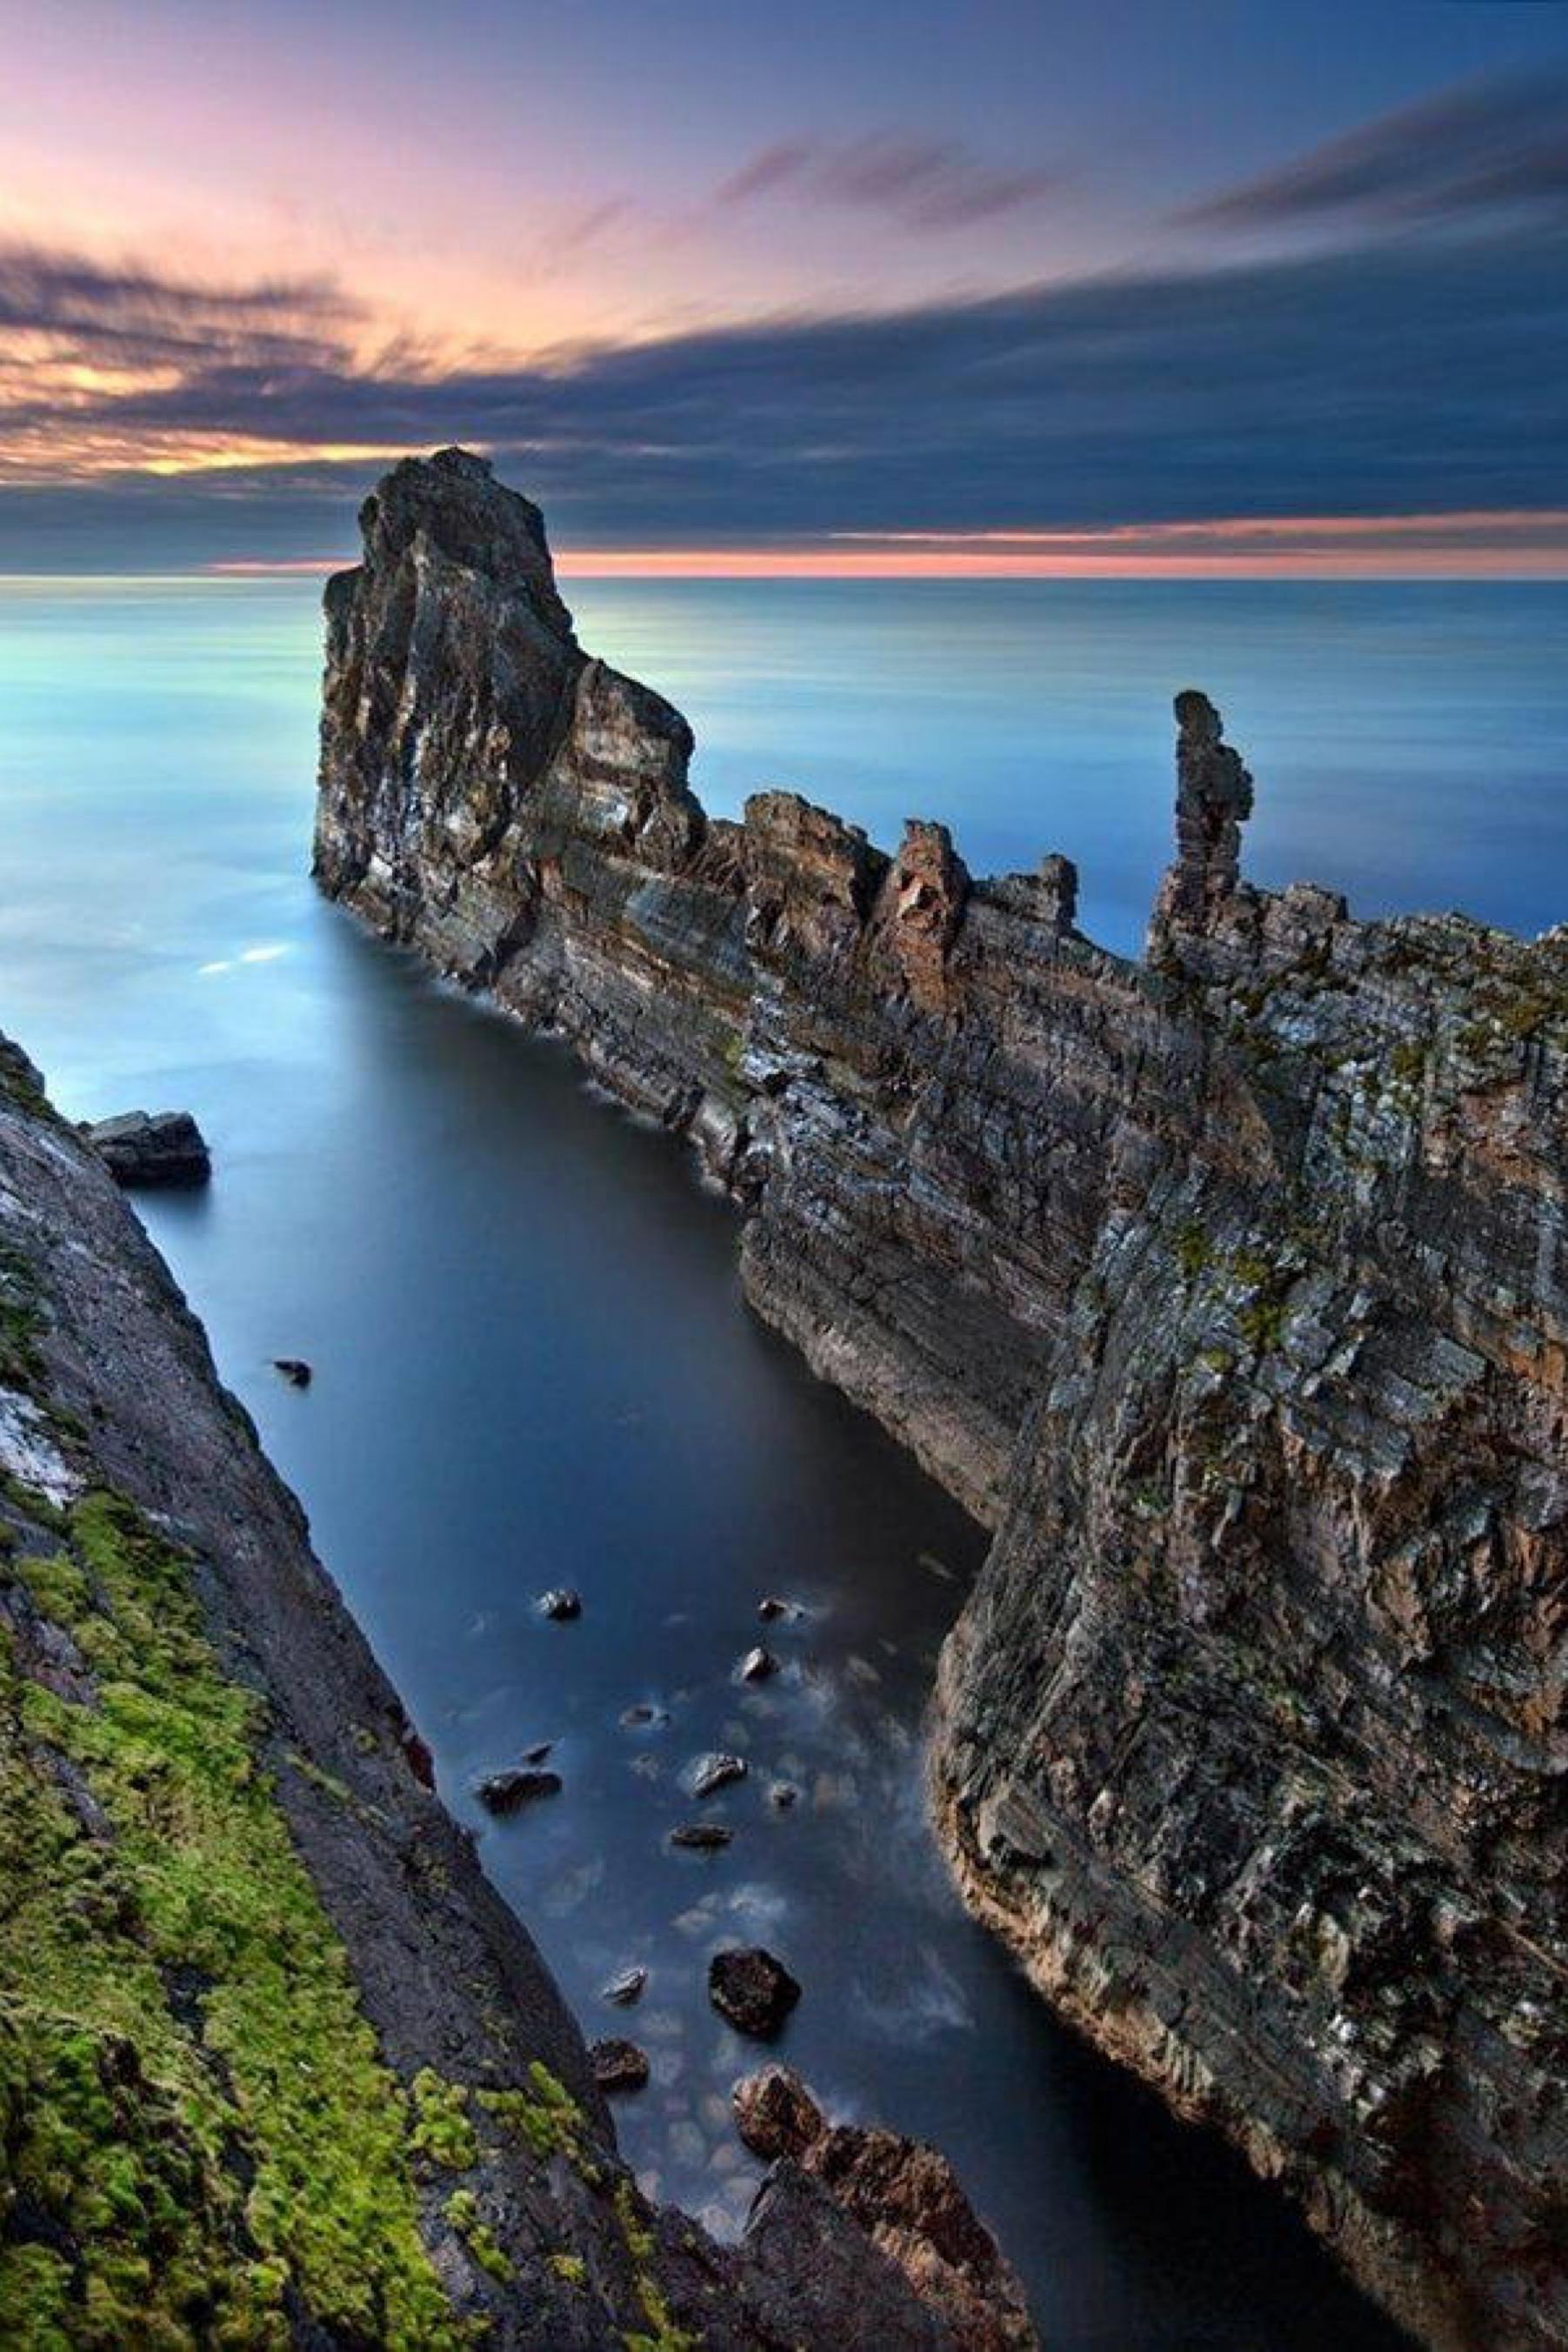 ireland rock sea coast ocean beach water cliff landscape geological formation